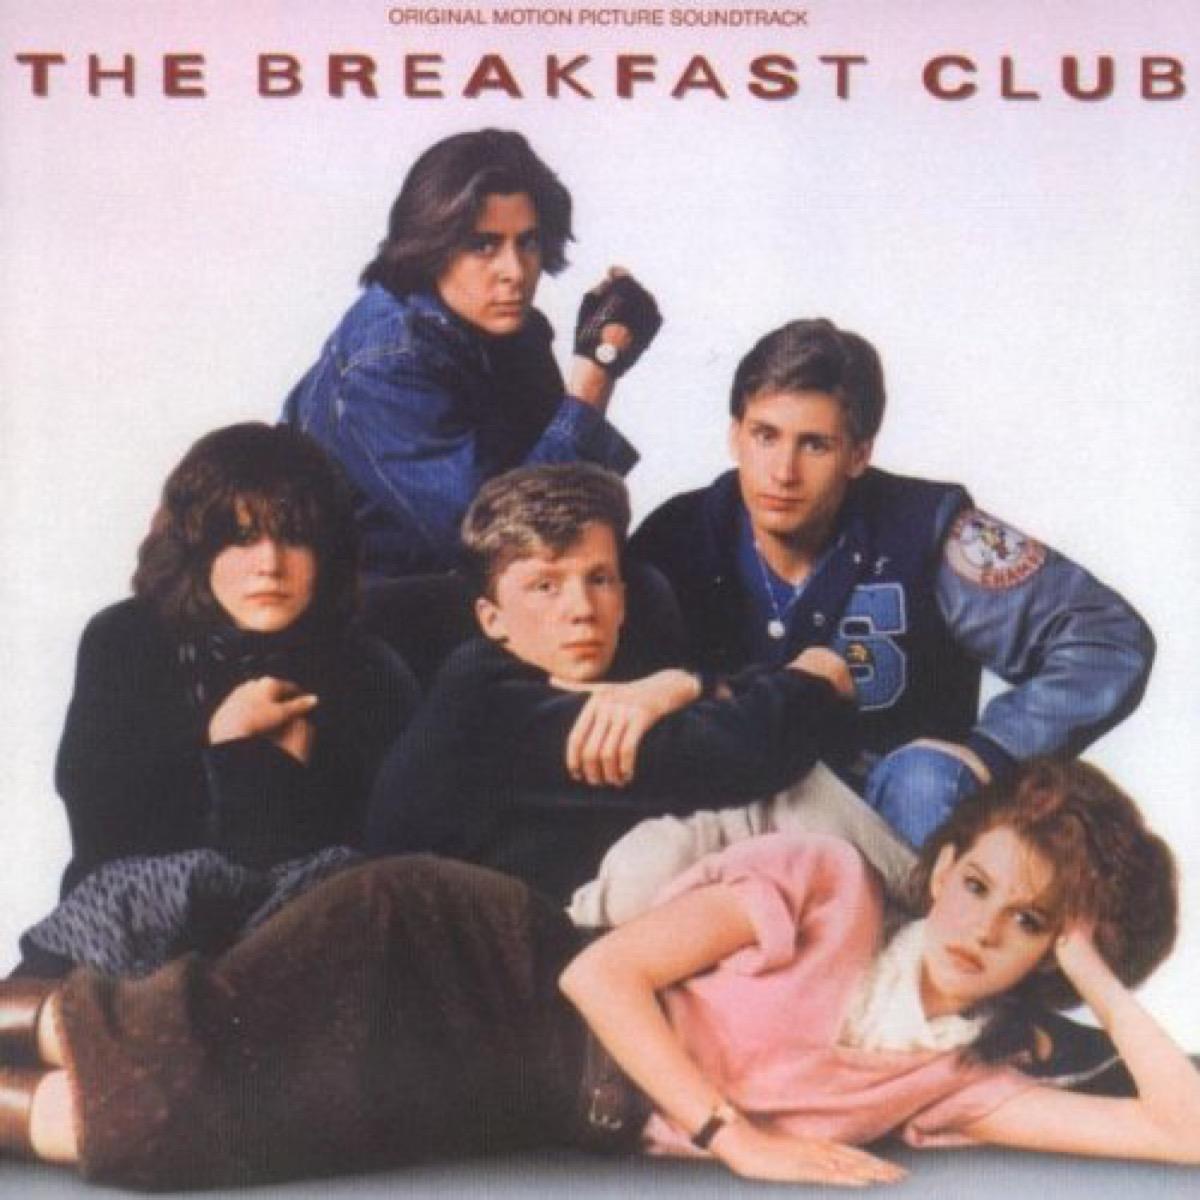 the breakfast club movie soundtrack